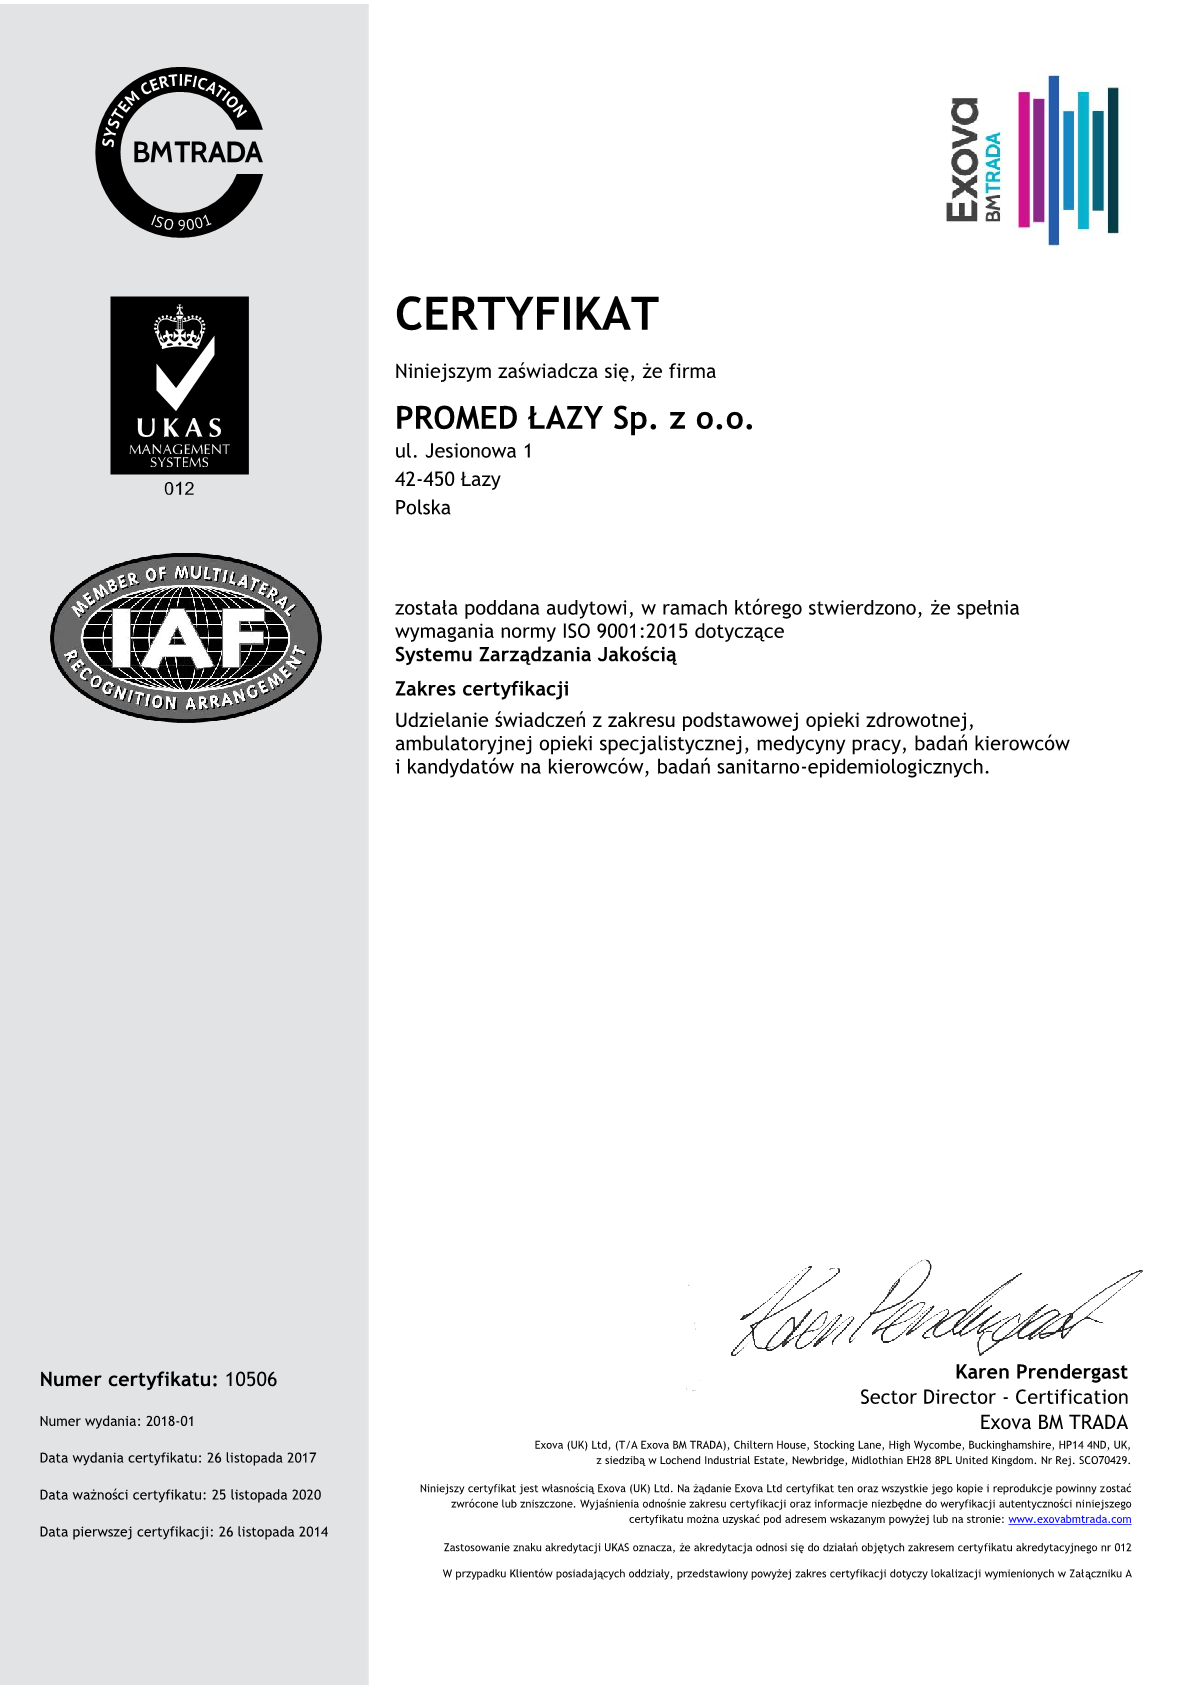 2018 Promed QMS Certyfikat PL1